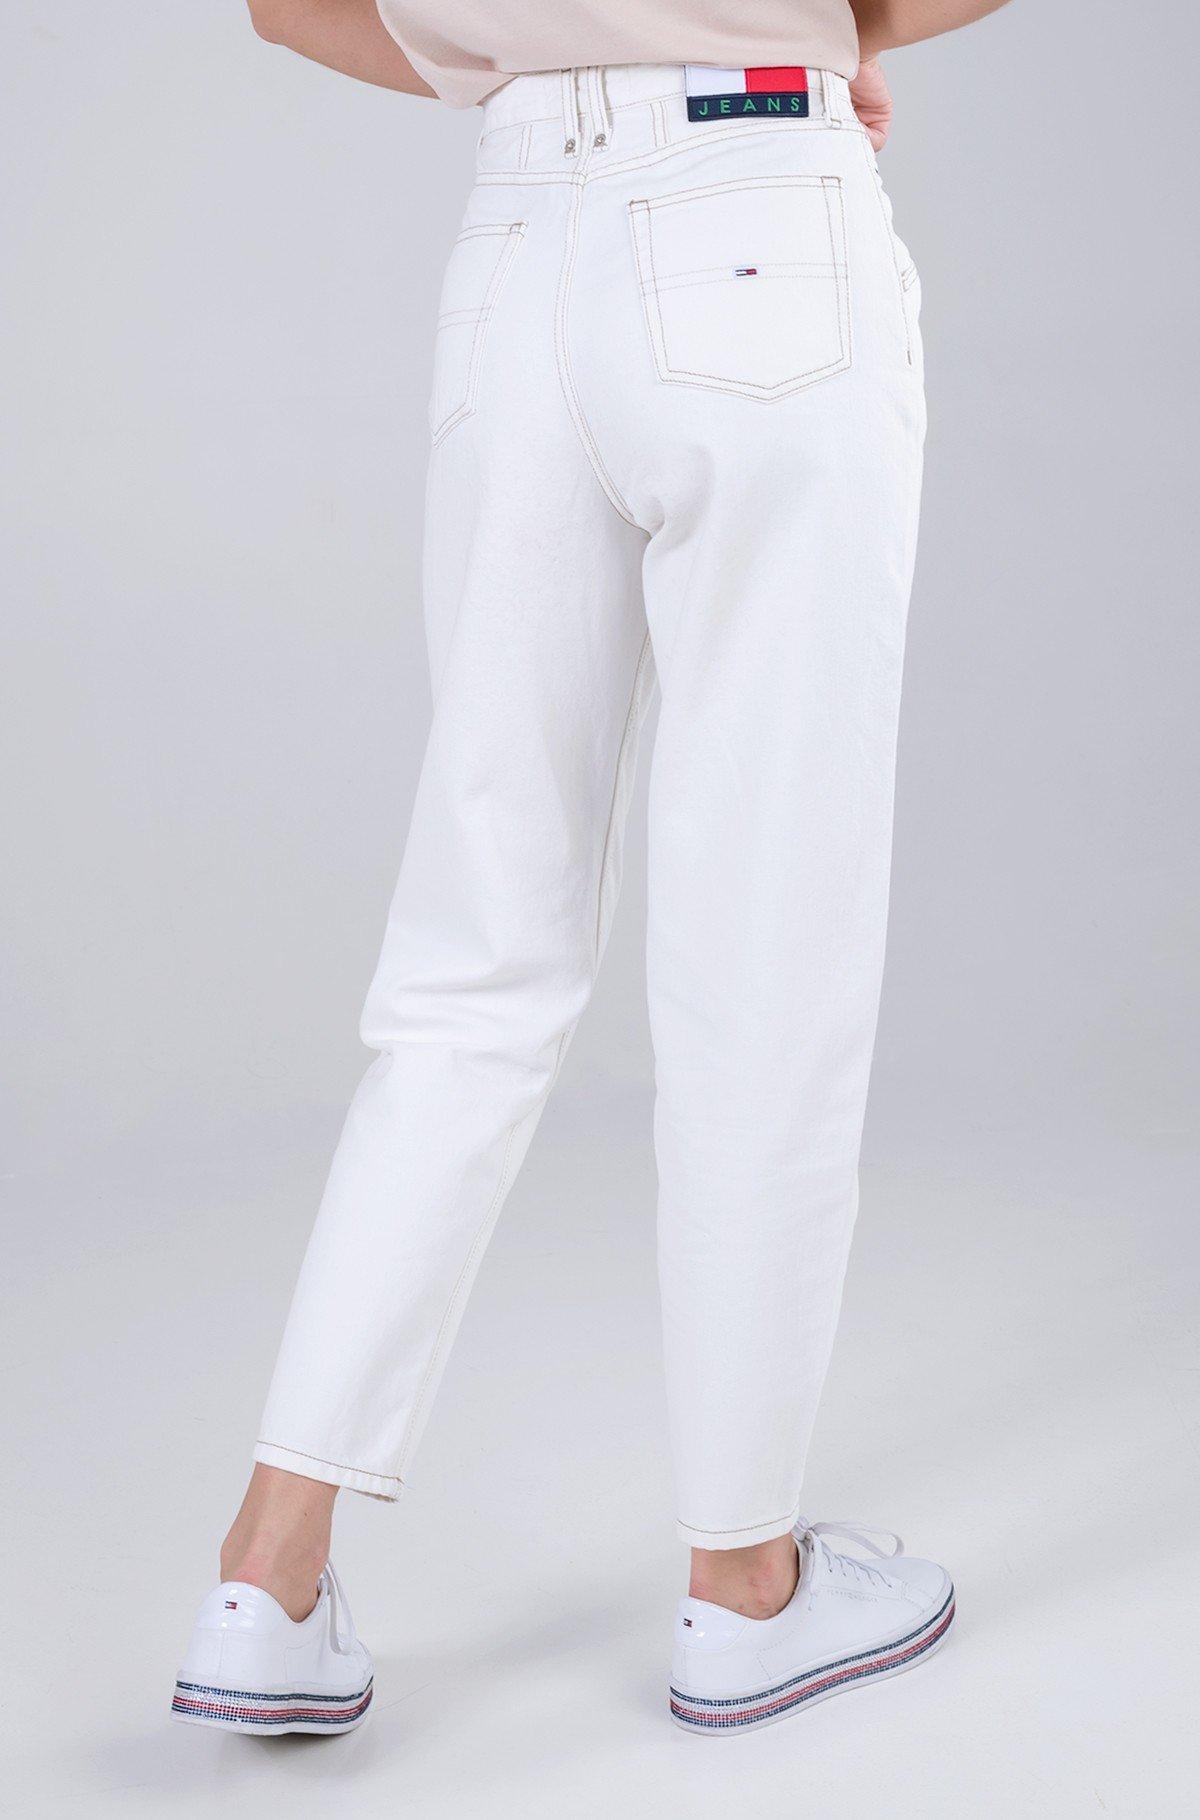 Jeans MOM JEAN KP UHR TPRD AE795 SWR-full-3